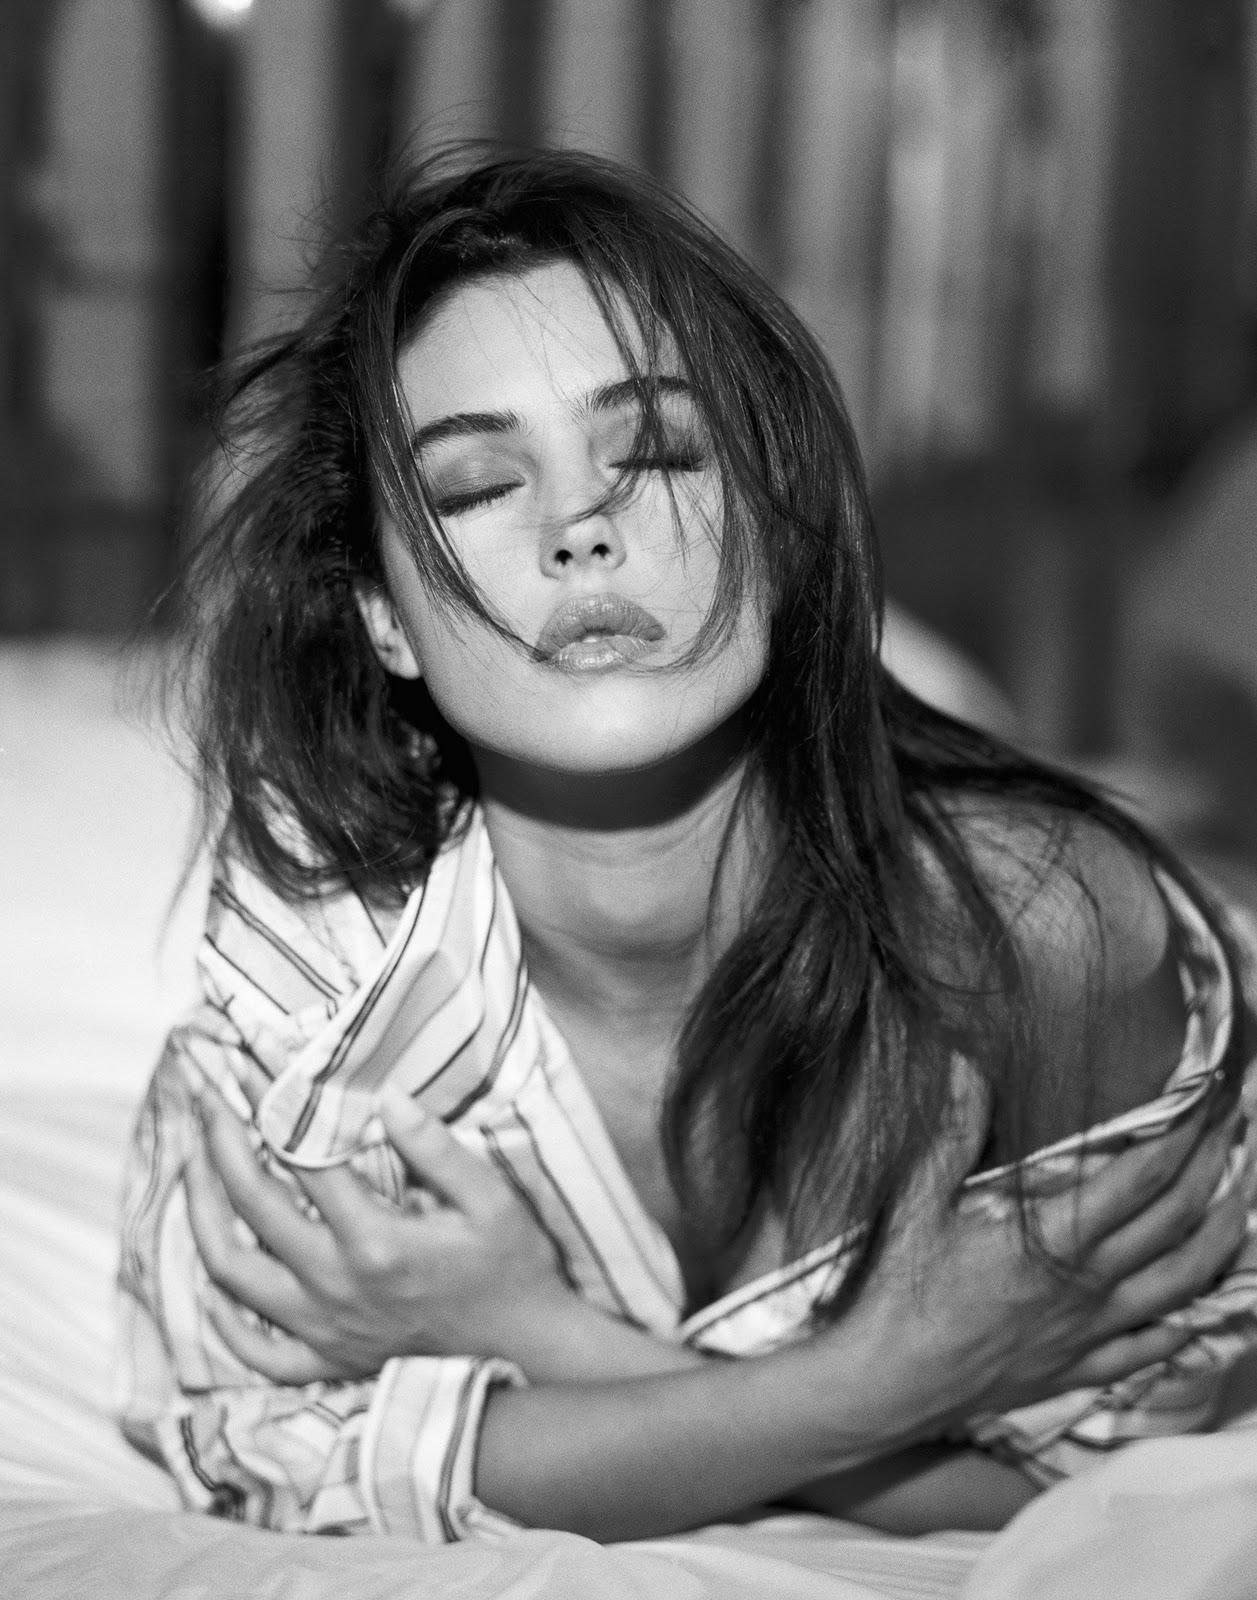 monica bellucci sexy pornhub cgen